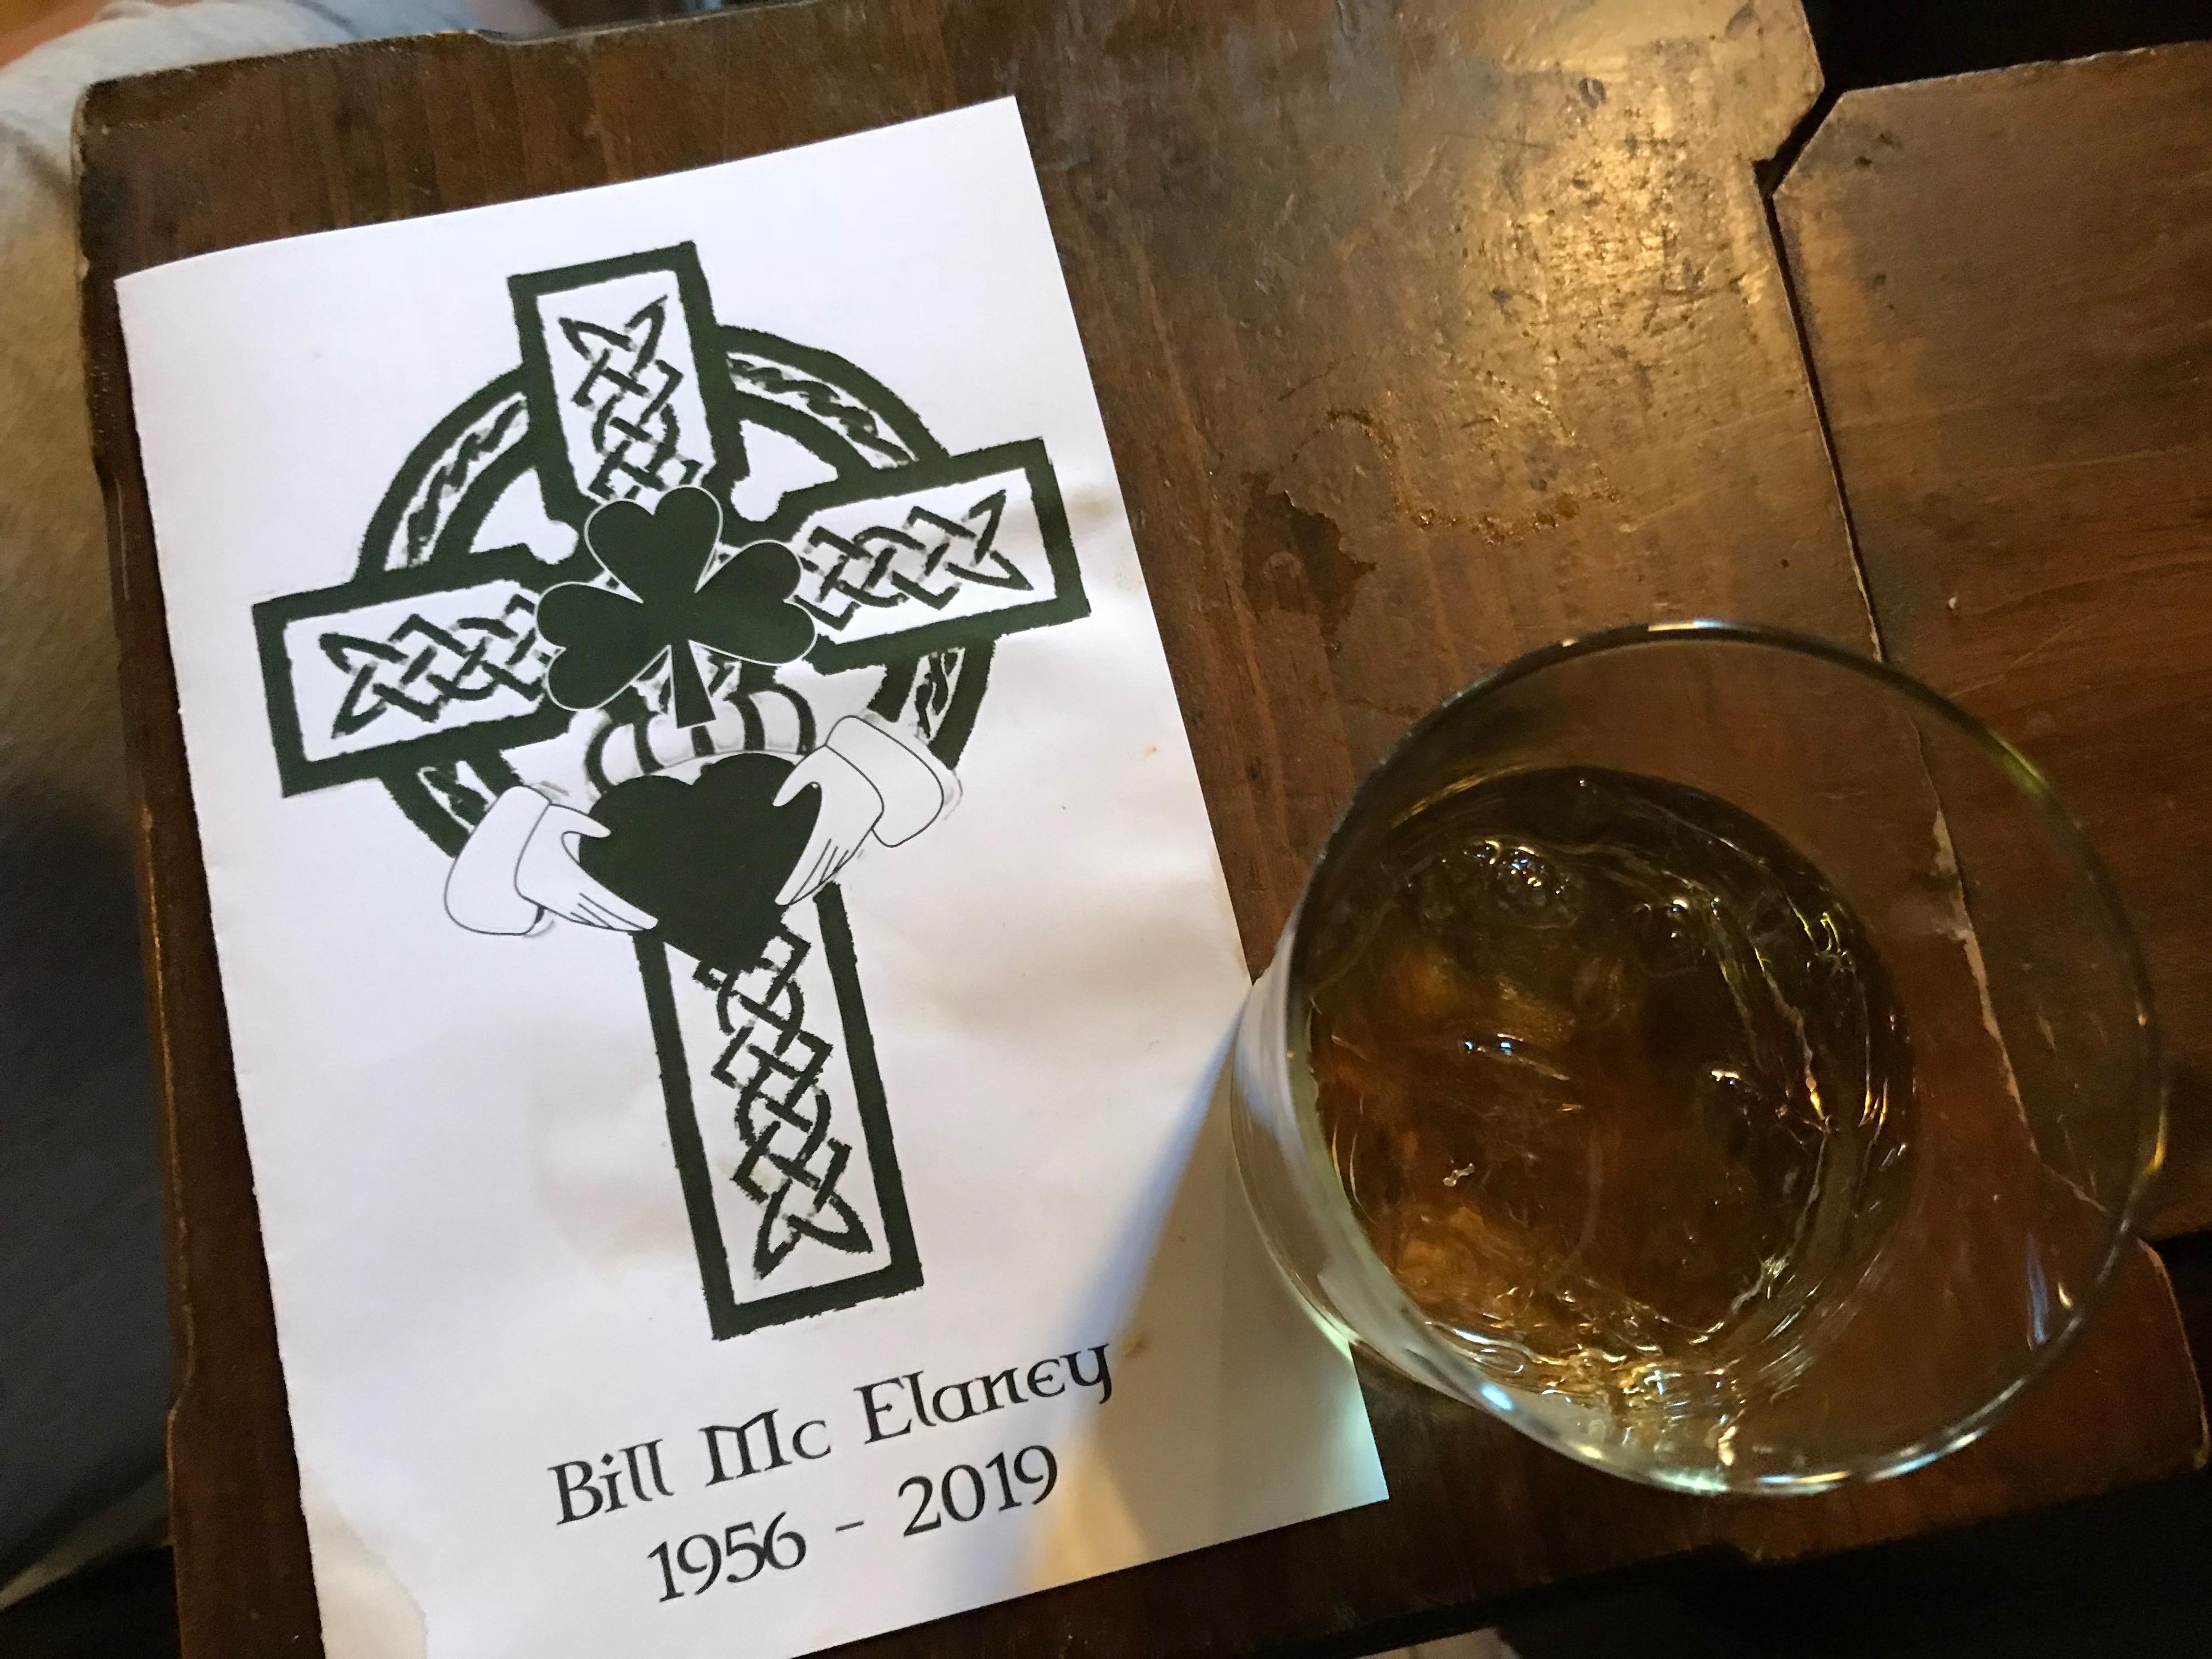 Bill McElaney, 1956 - 2019